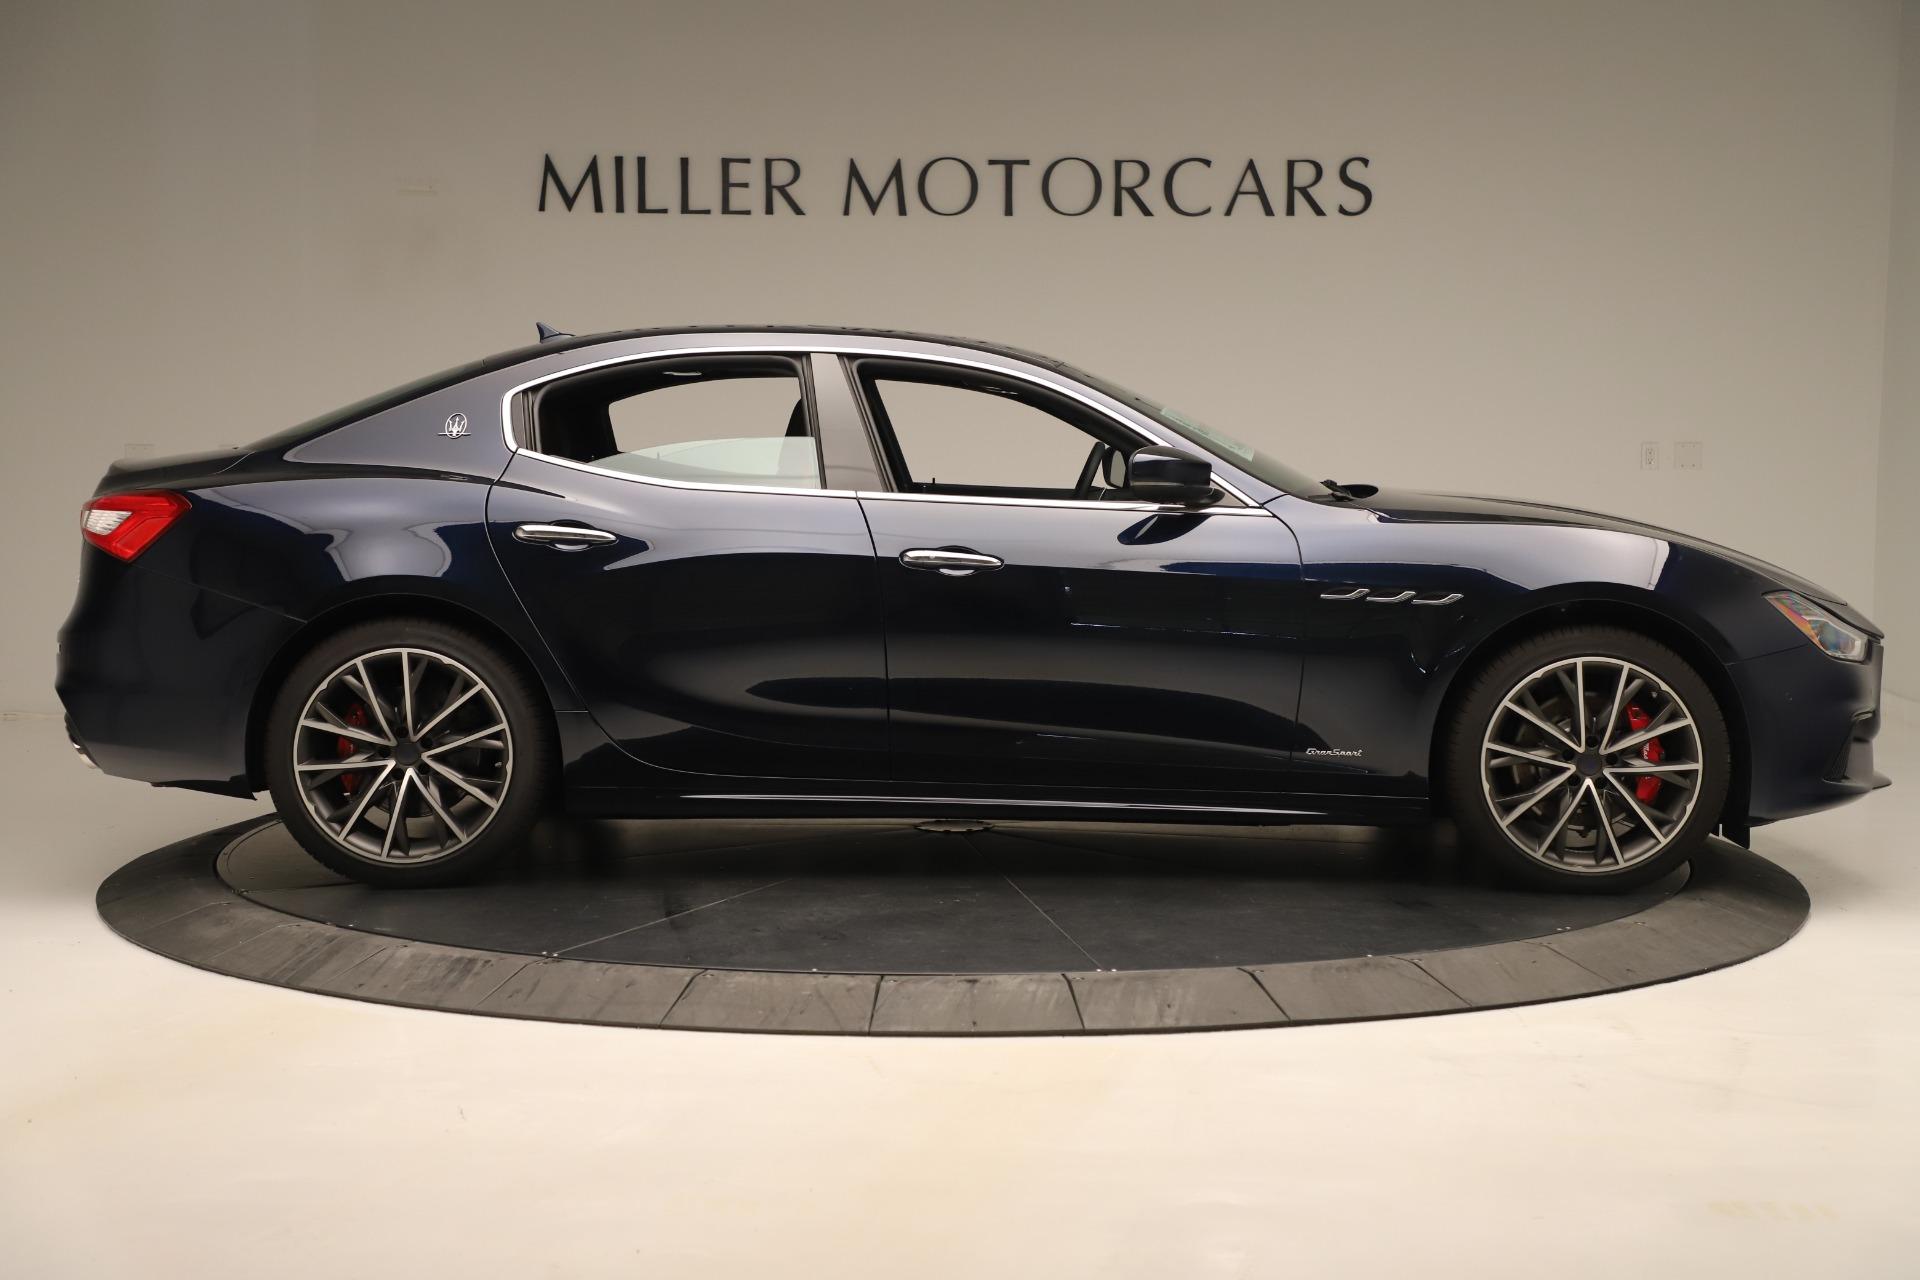 New 2019 Maserati Ghibli S Q4 GranSport For Sale In Greenwich, CT 2949_p9